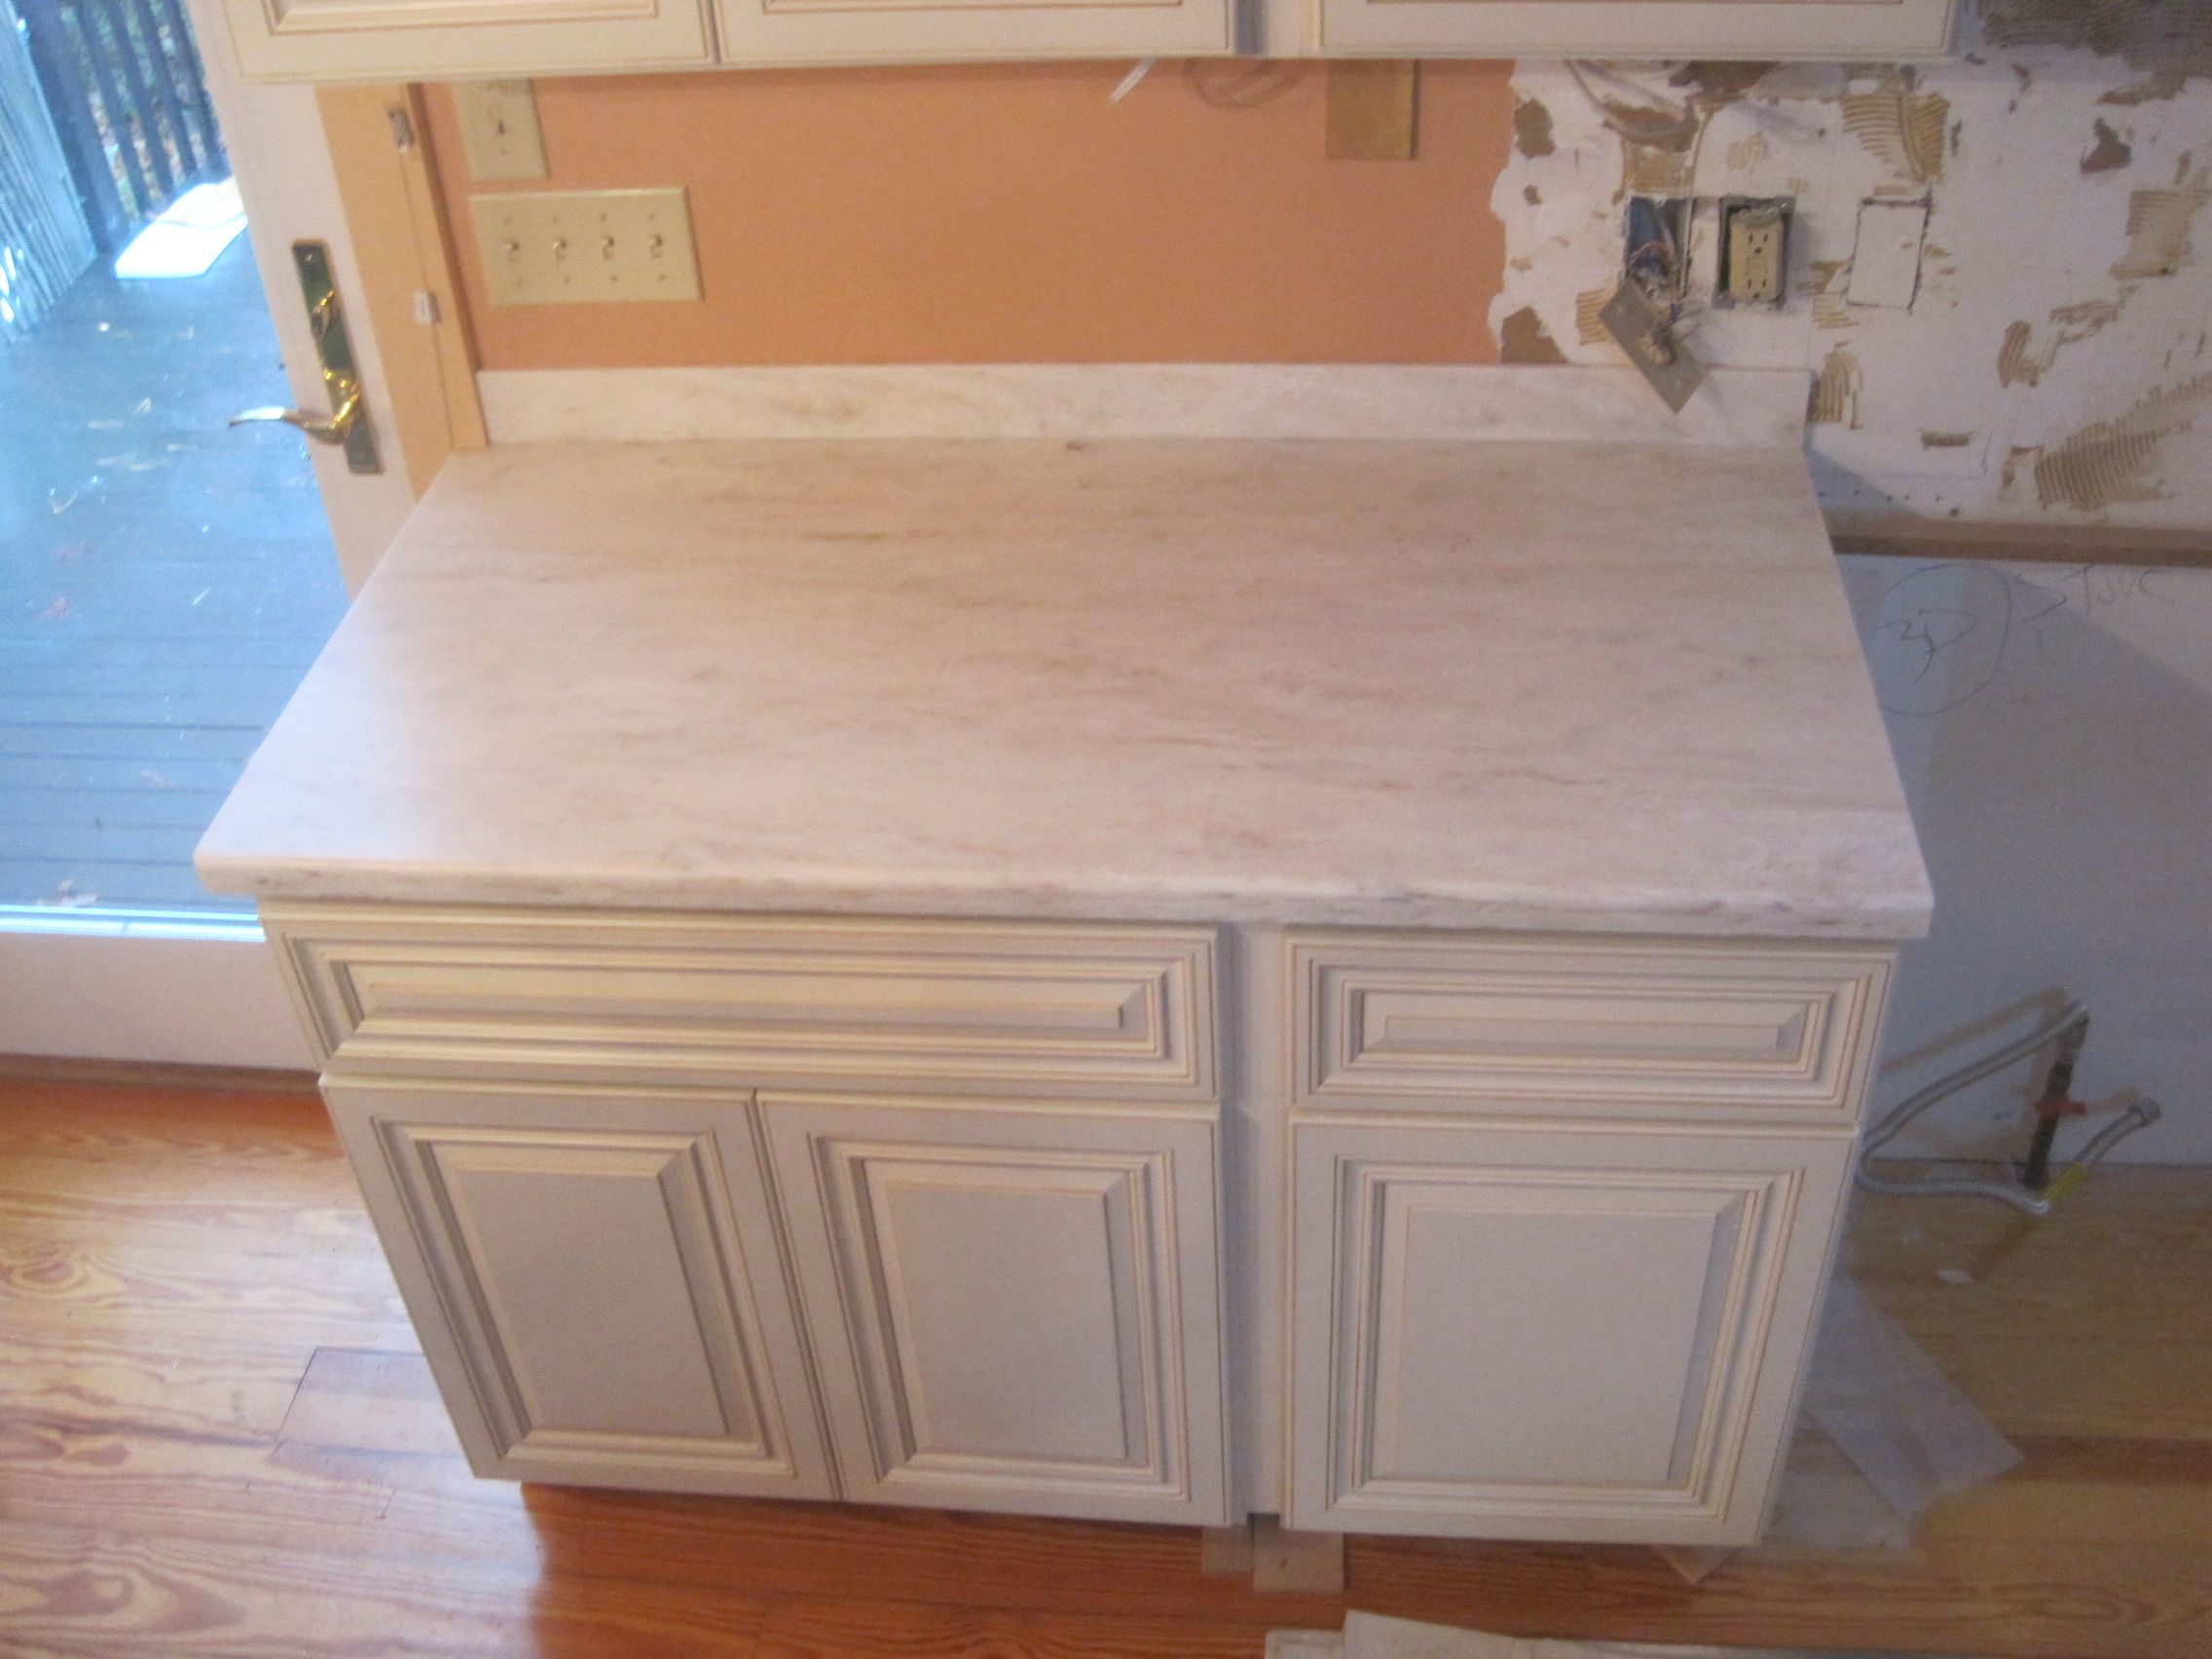 corian kitchen countertops Also corian witch hazel countertop